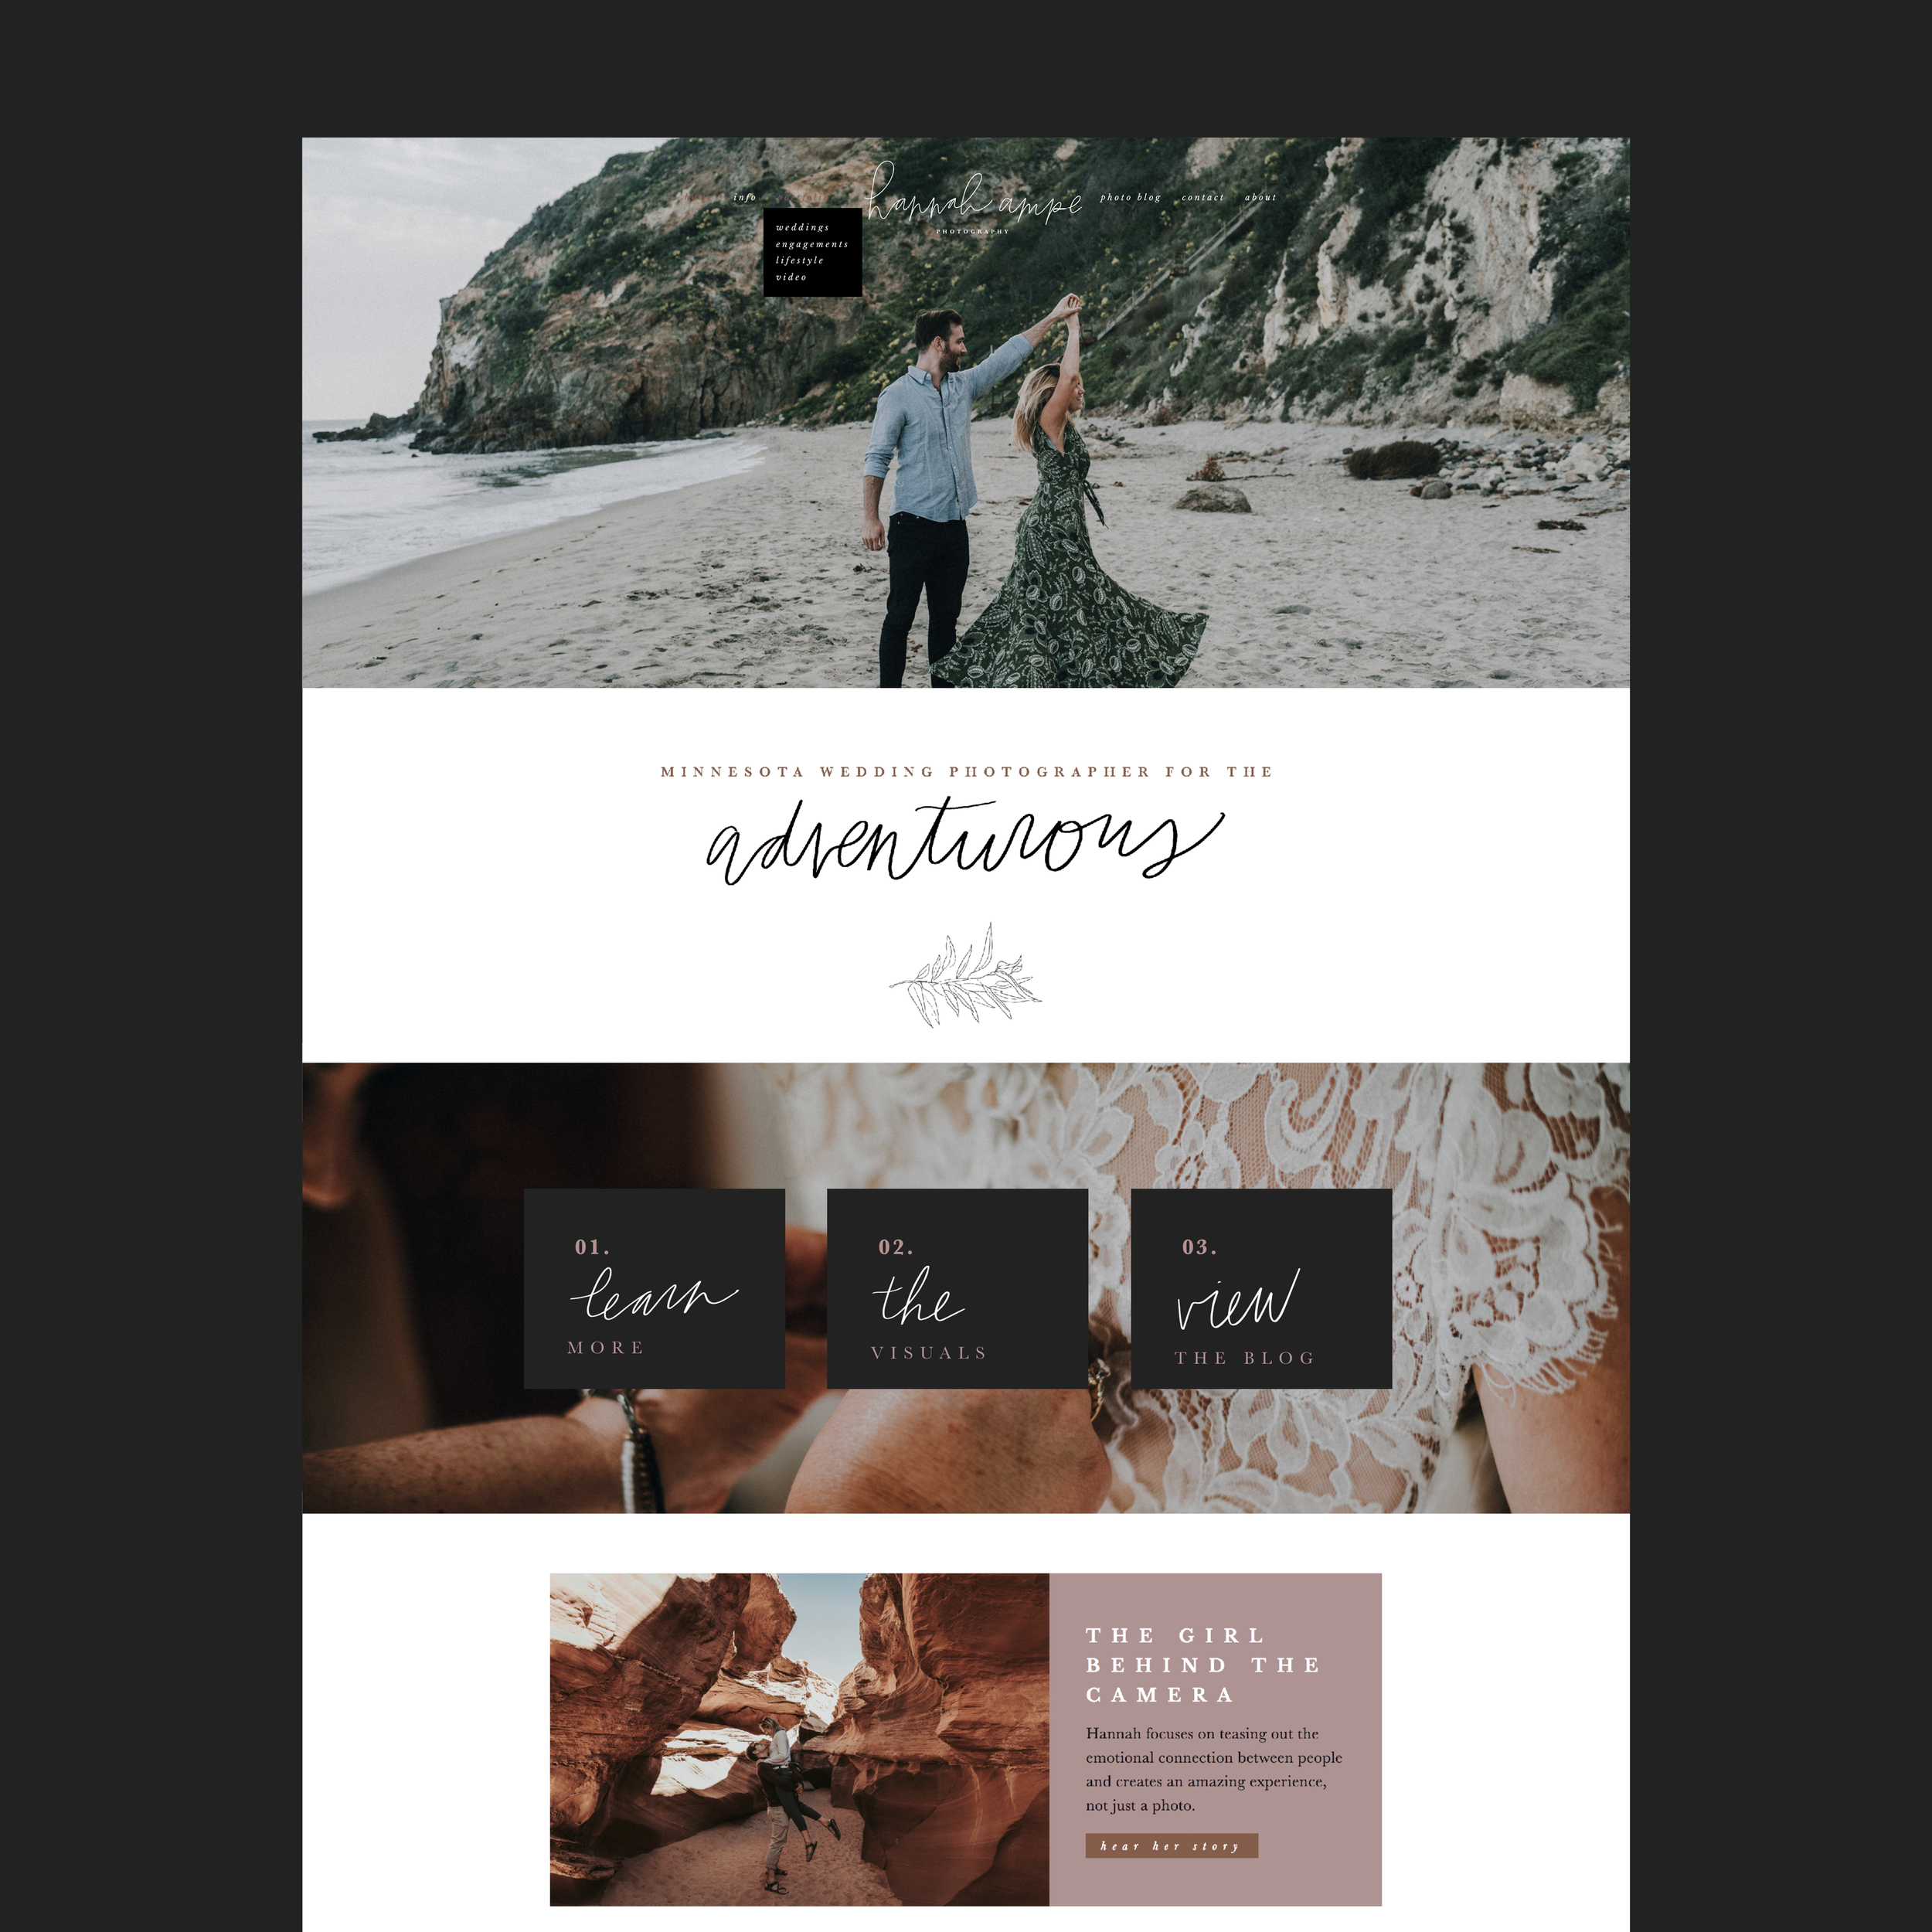 hannah+ampe+website+design+web+designer+adventurous+script+loose+whimsical+neutral+photography+black+home+page+weddingphotographer